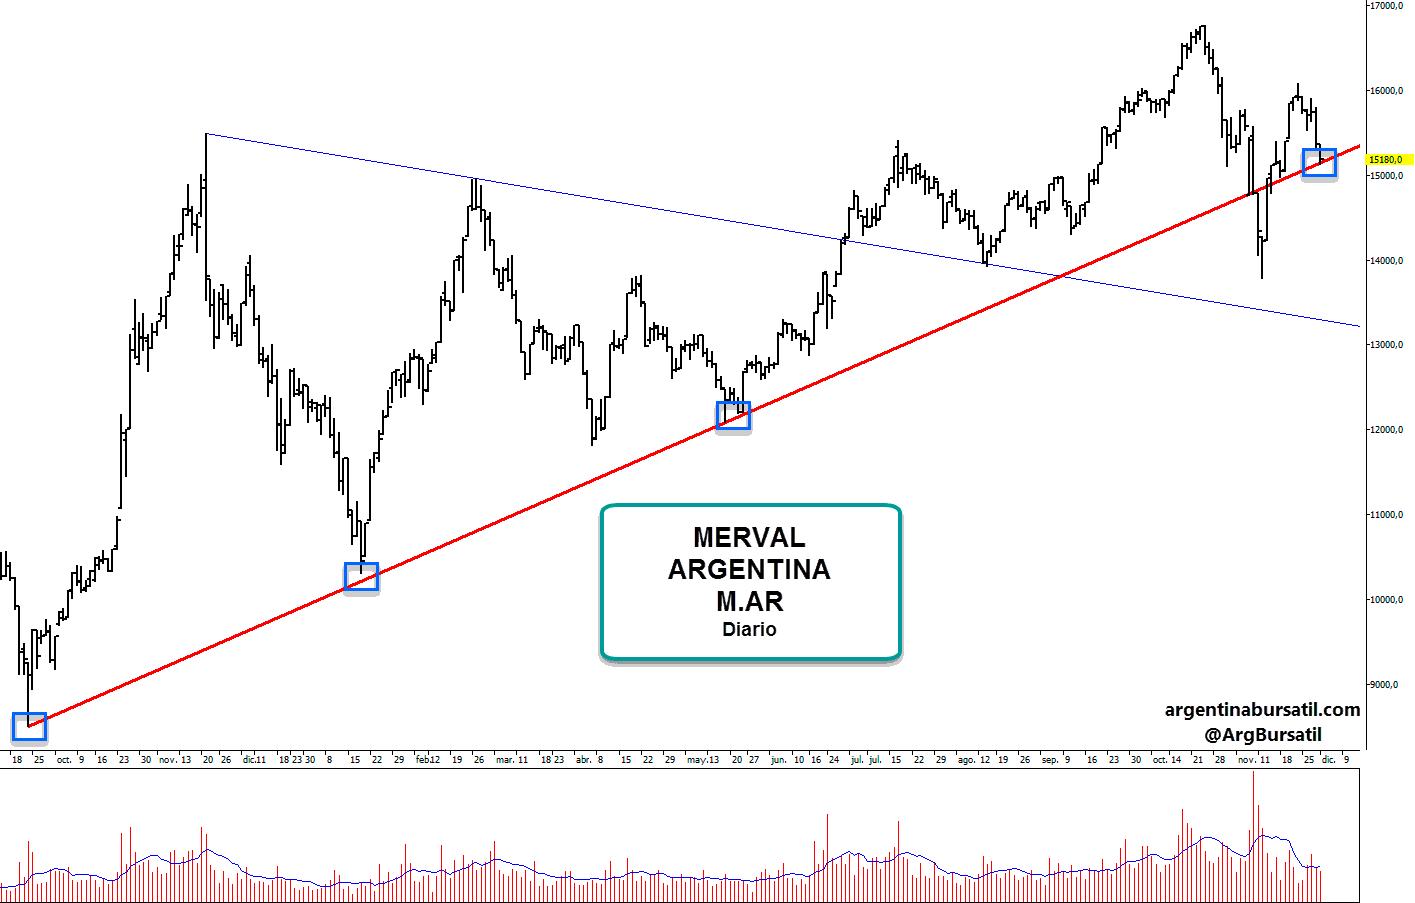 Merval Argentina